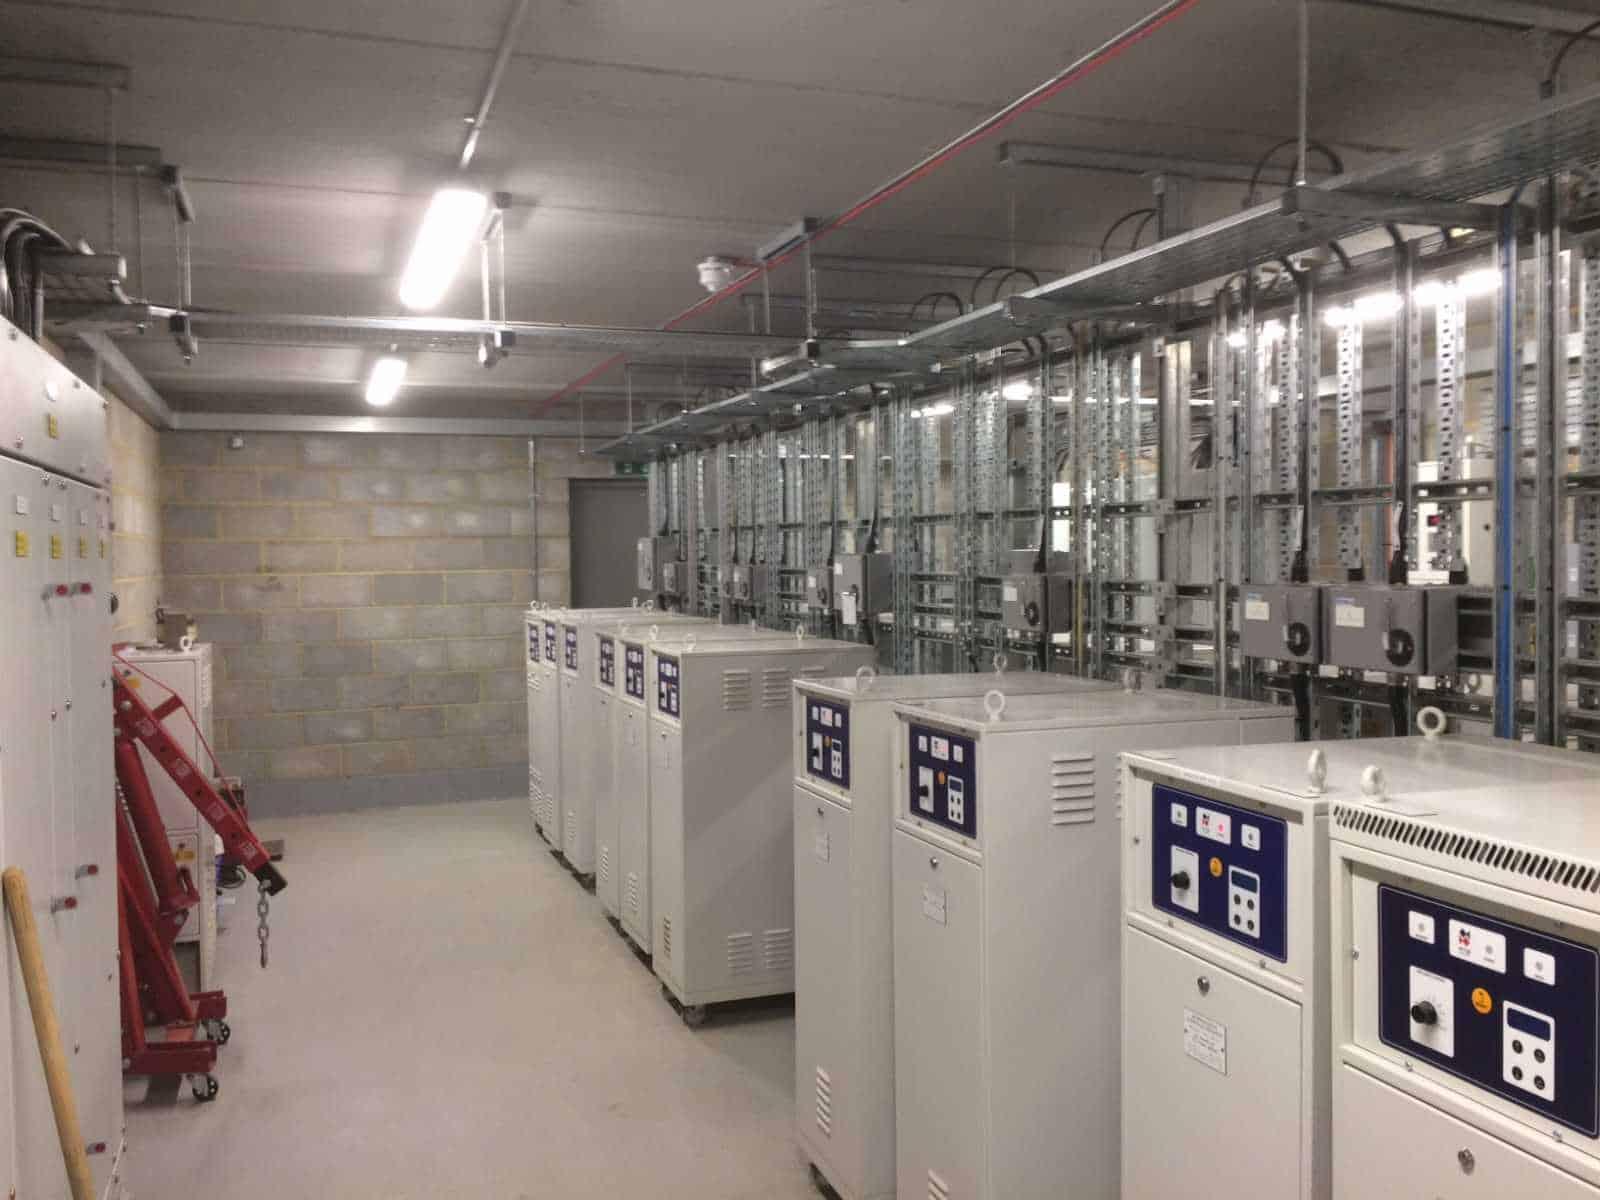 Farnborough_Turnkey_Solution_substation_CCR